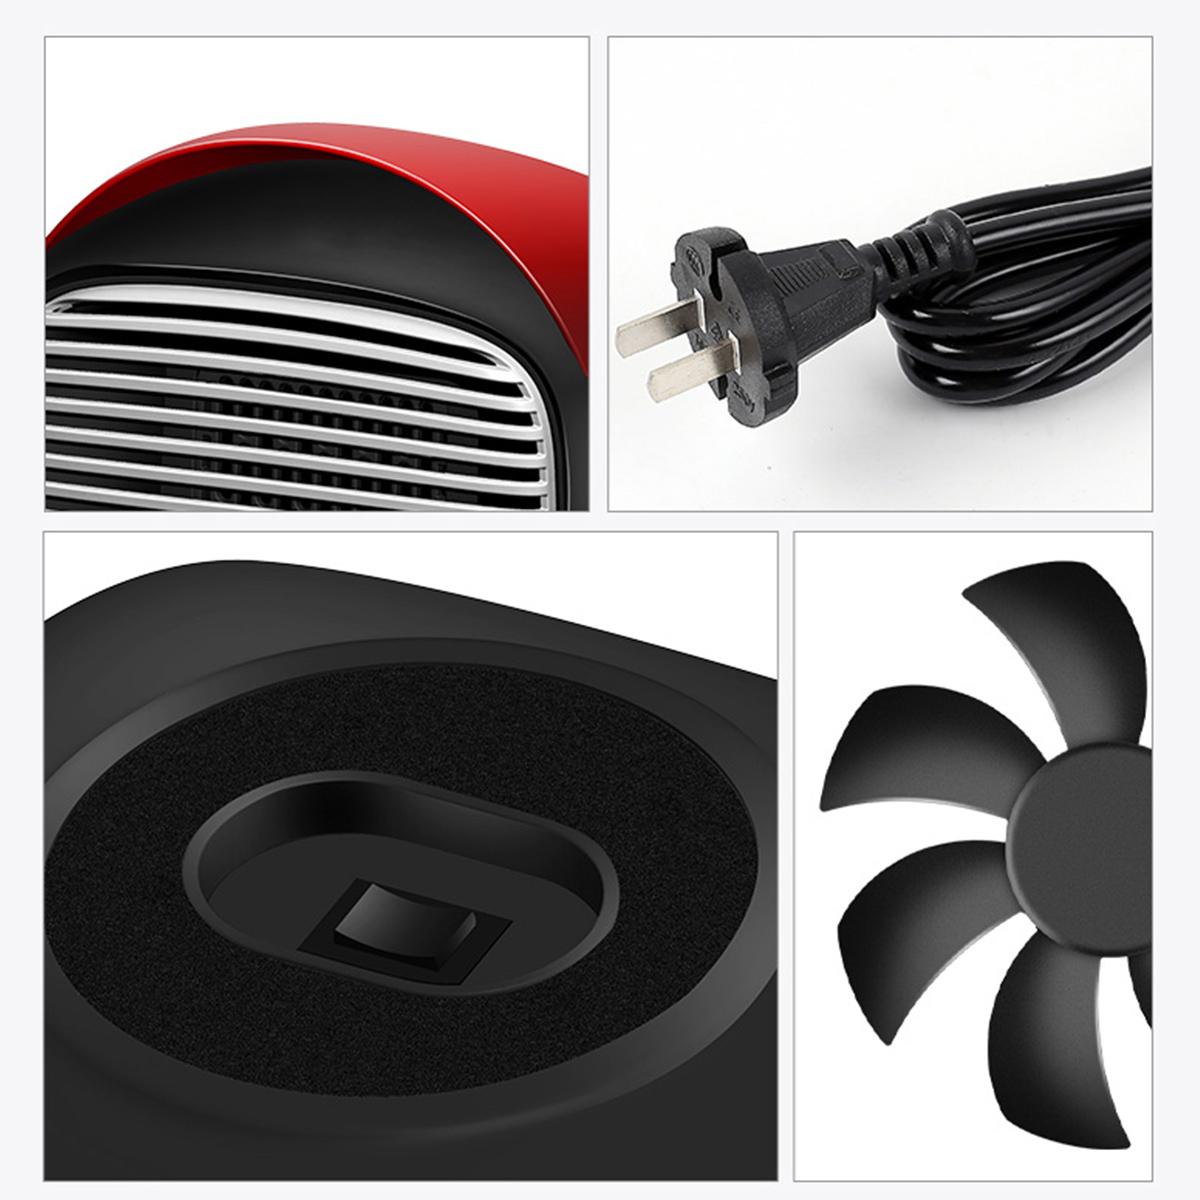 800W Portable Electric Heater Mini Ceramic Hot Air Heating Fan Winter Home Space Warmer